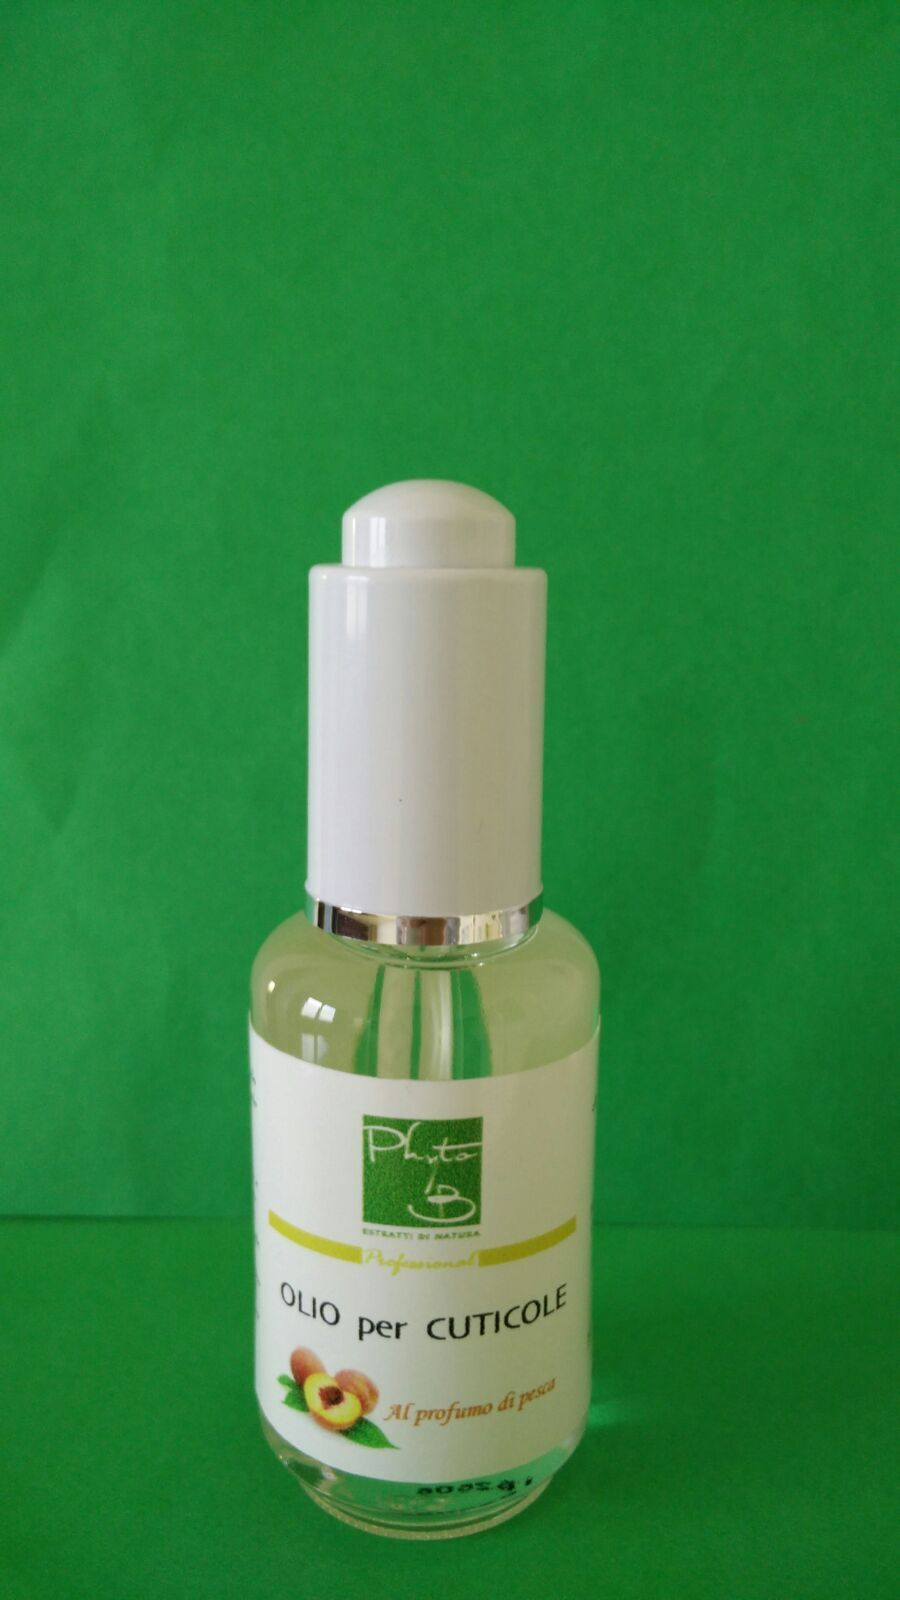 Olio per Cuticole pesca unghie jojoba avocado 30 ml